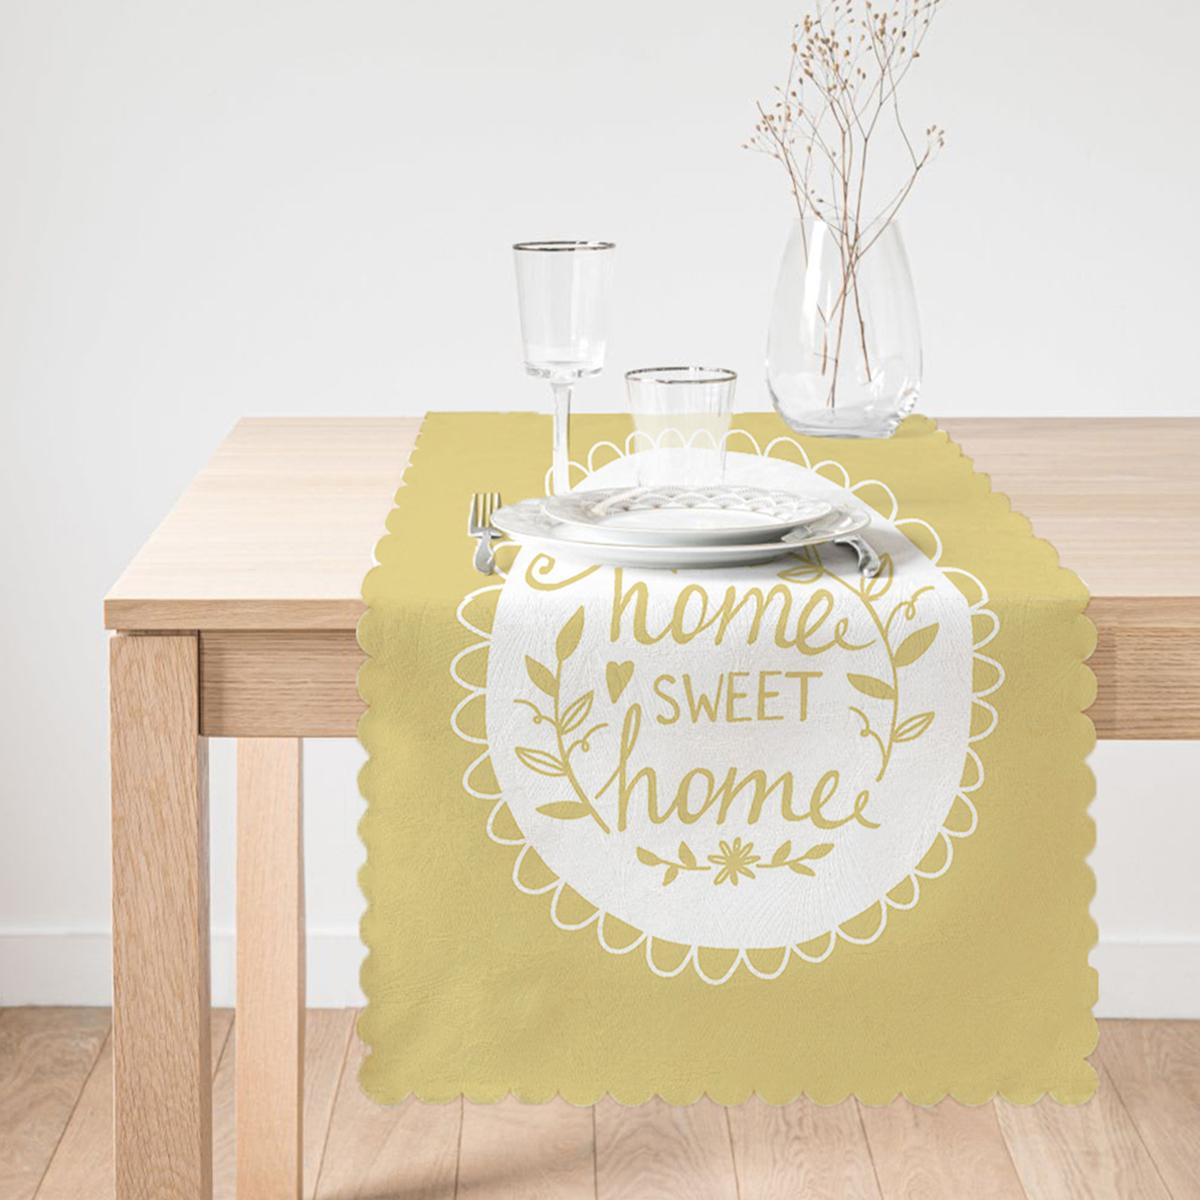 Home Sweet Home Dijital Baskılı Dekoratif Runner Realhomes